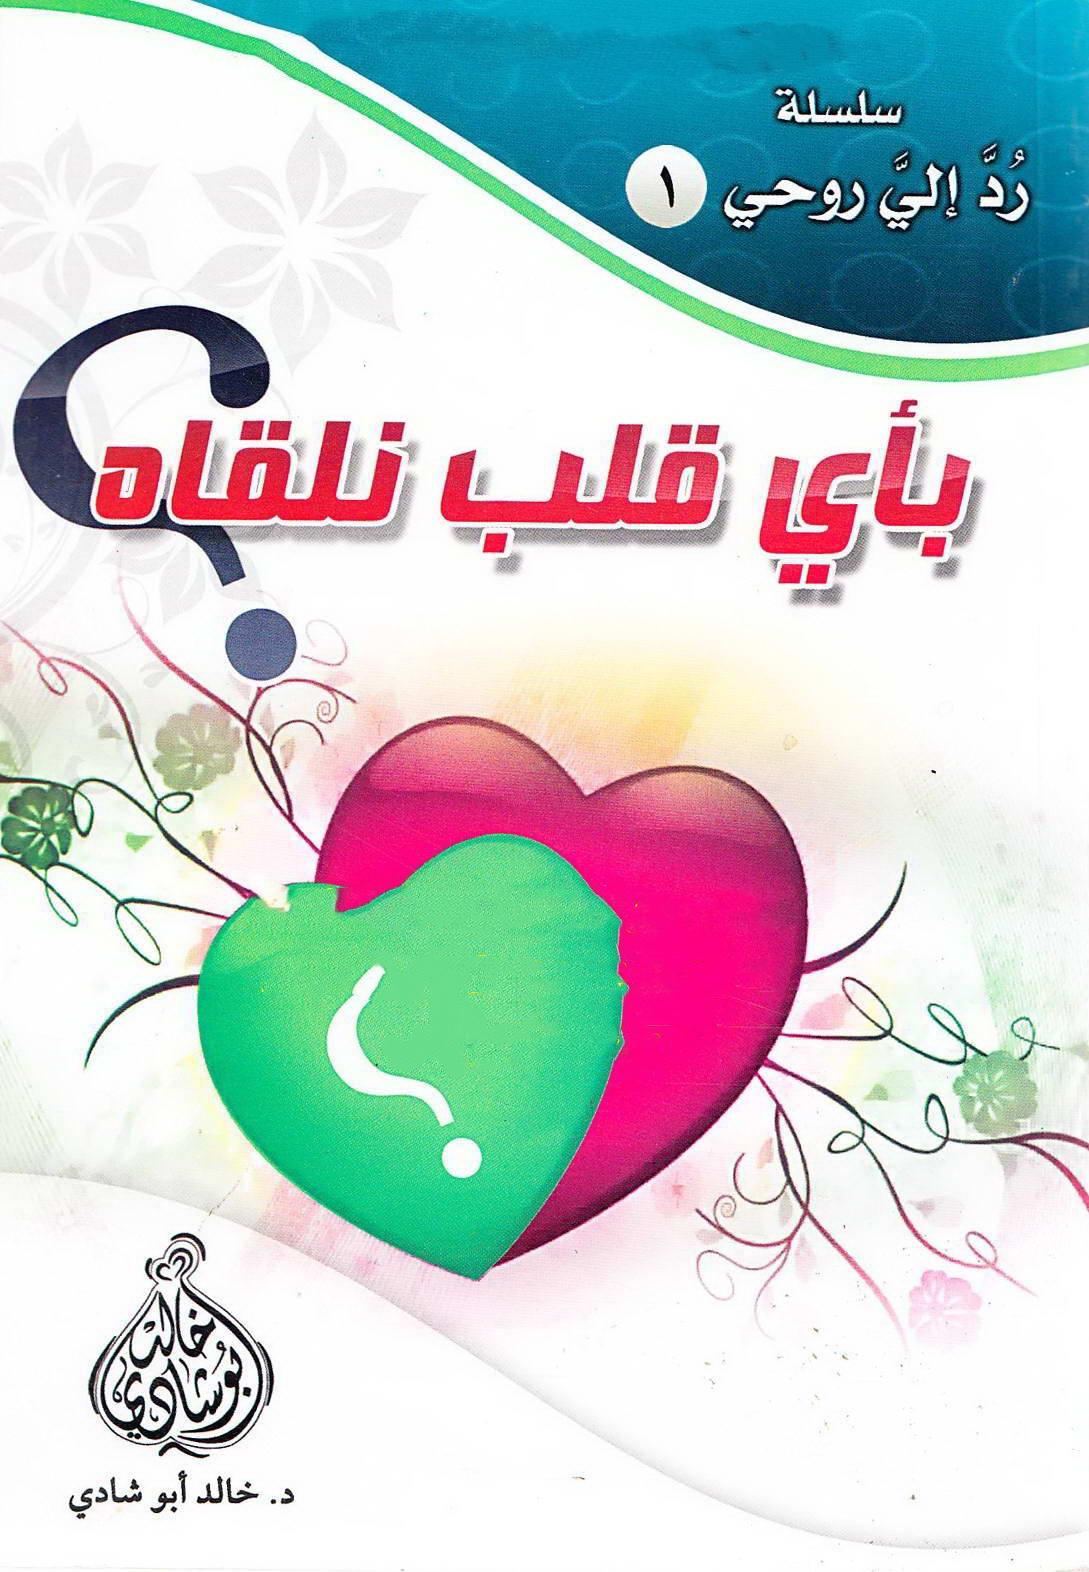 Photo of تحميل كتاب بأي قلب نلقاه pdf لـ خالد أبو شادي